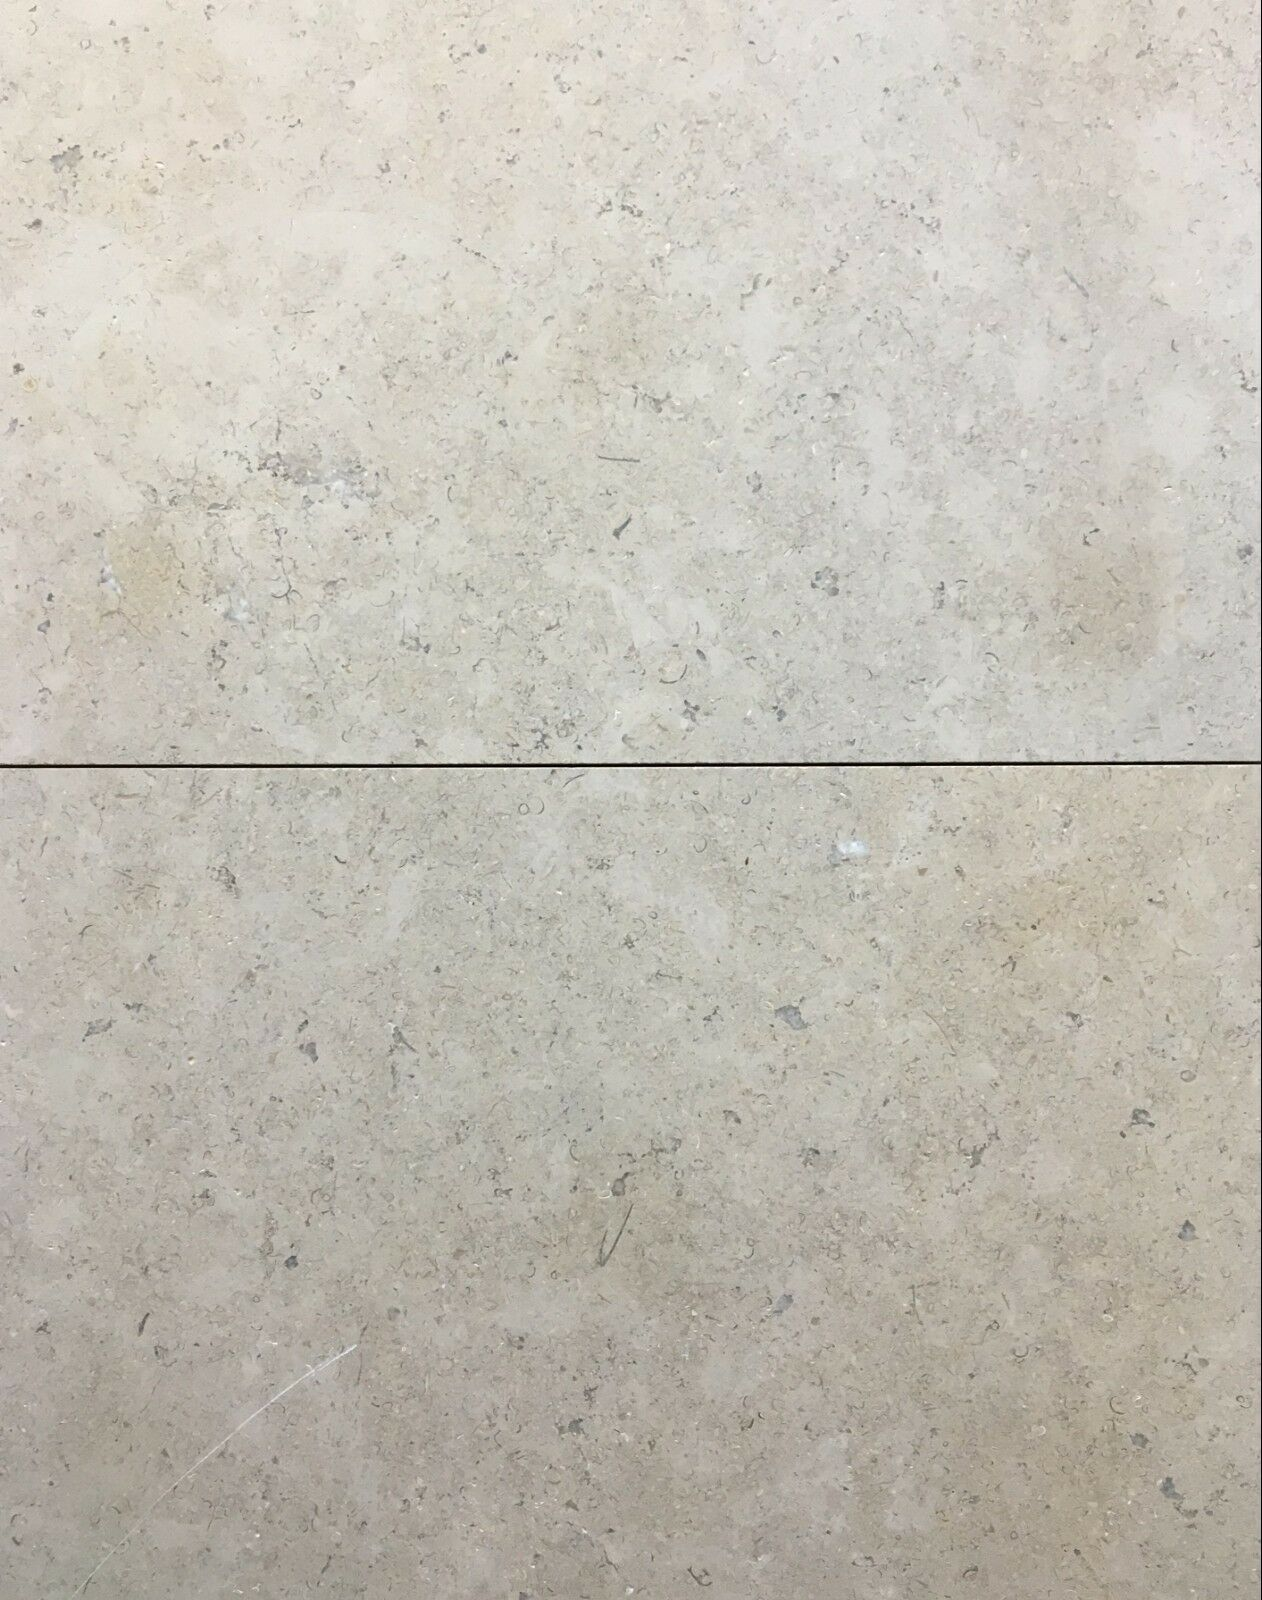 DIJON TUMBLED EDGE LIMESTONE TILES 600x900x15mm  PER SQM